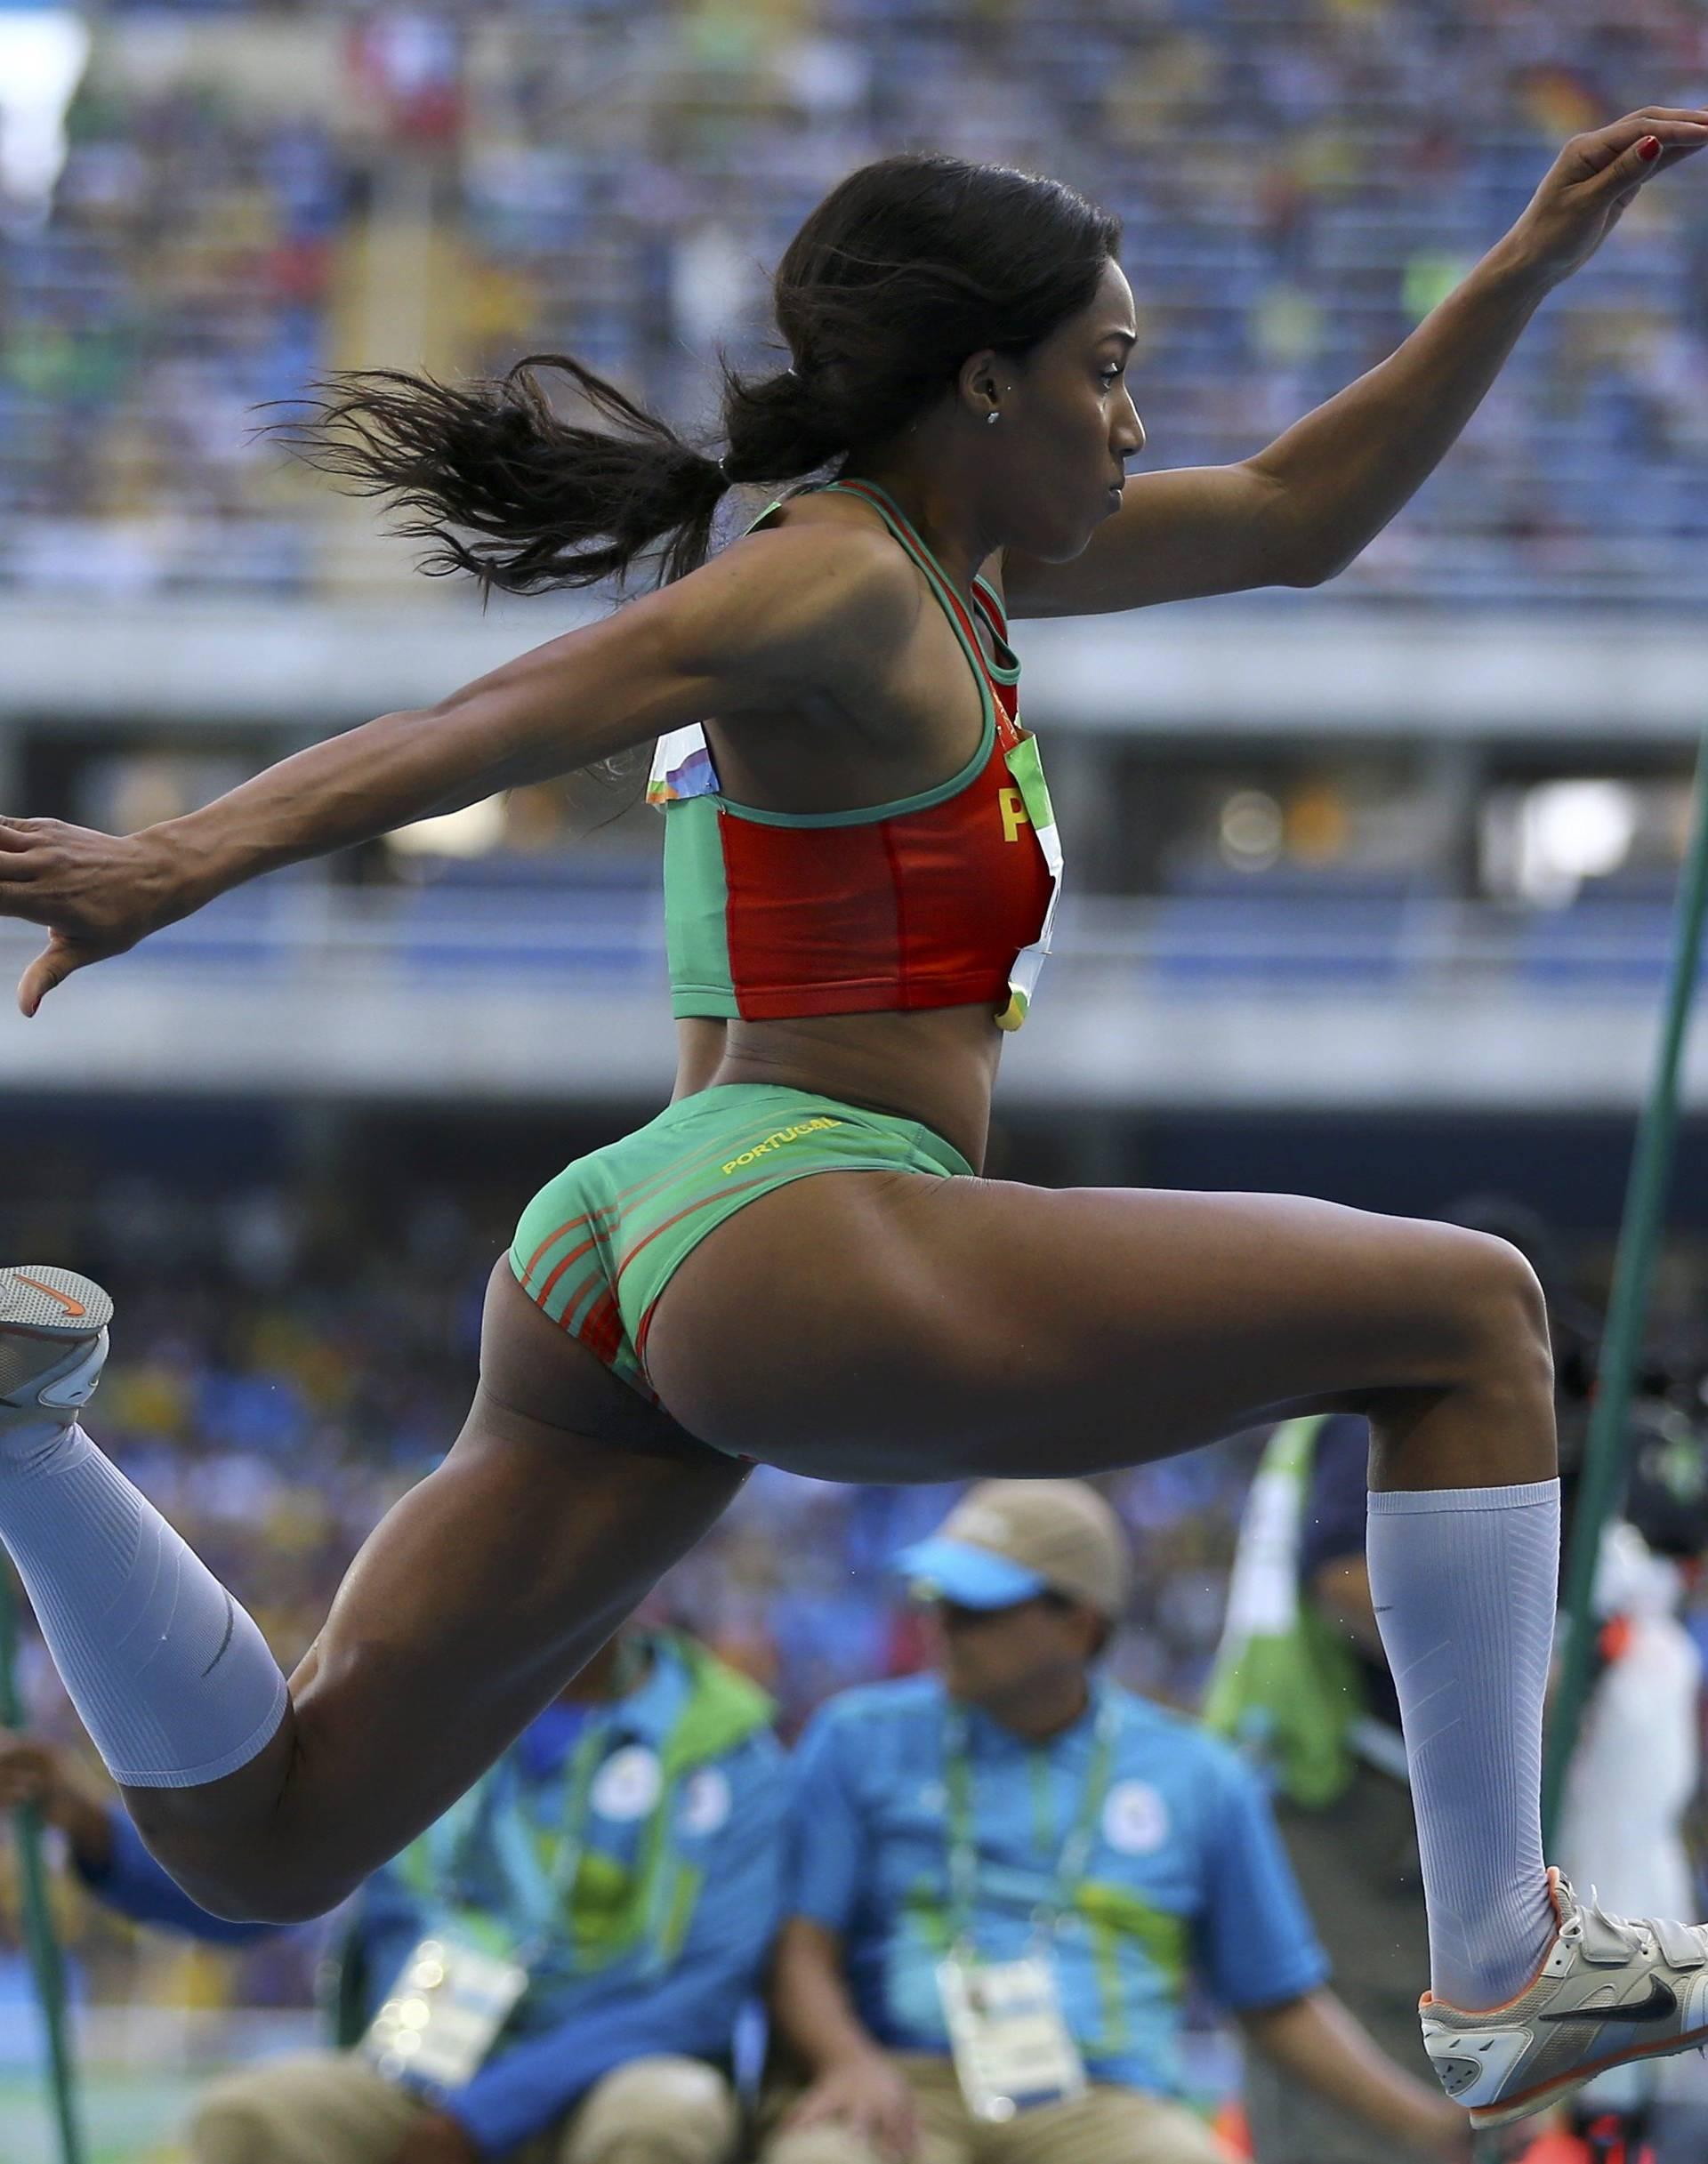 Athletics - Women's Triple Jump Qualifying Round - Groups